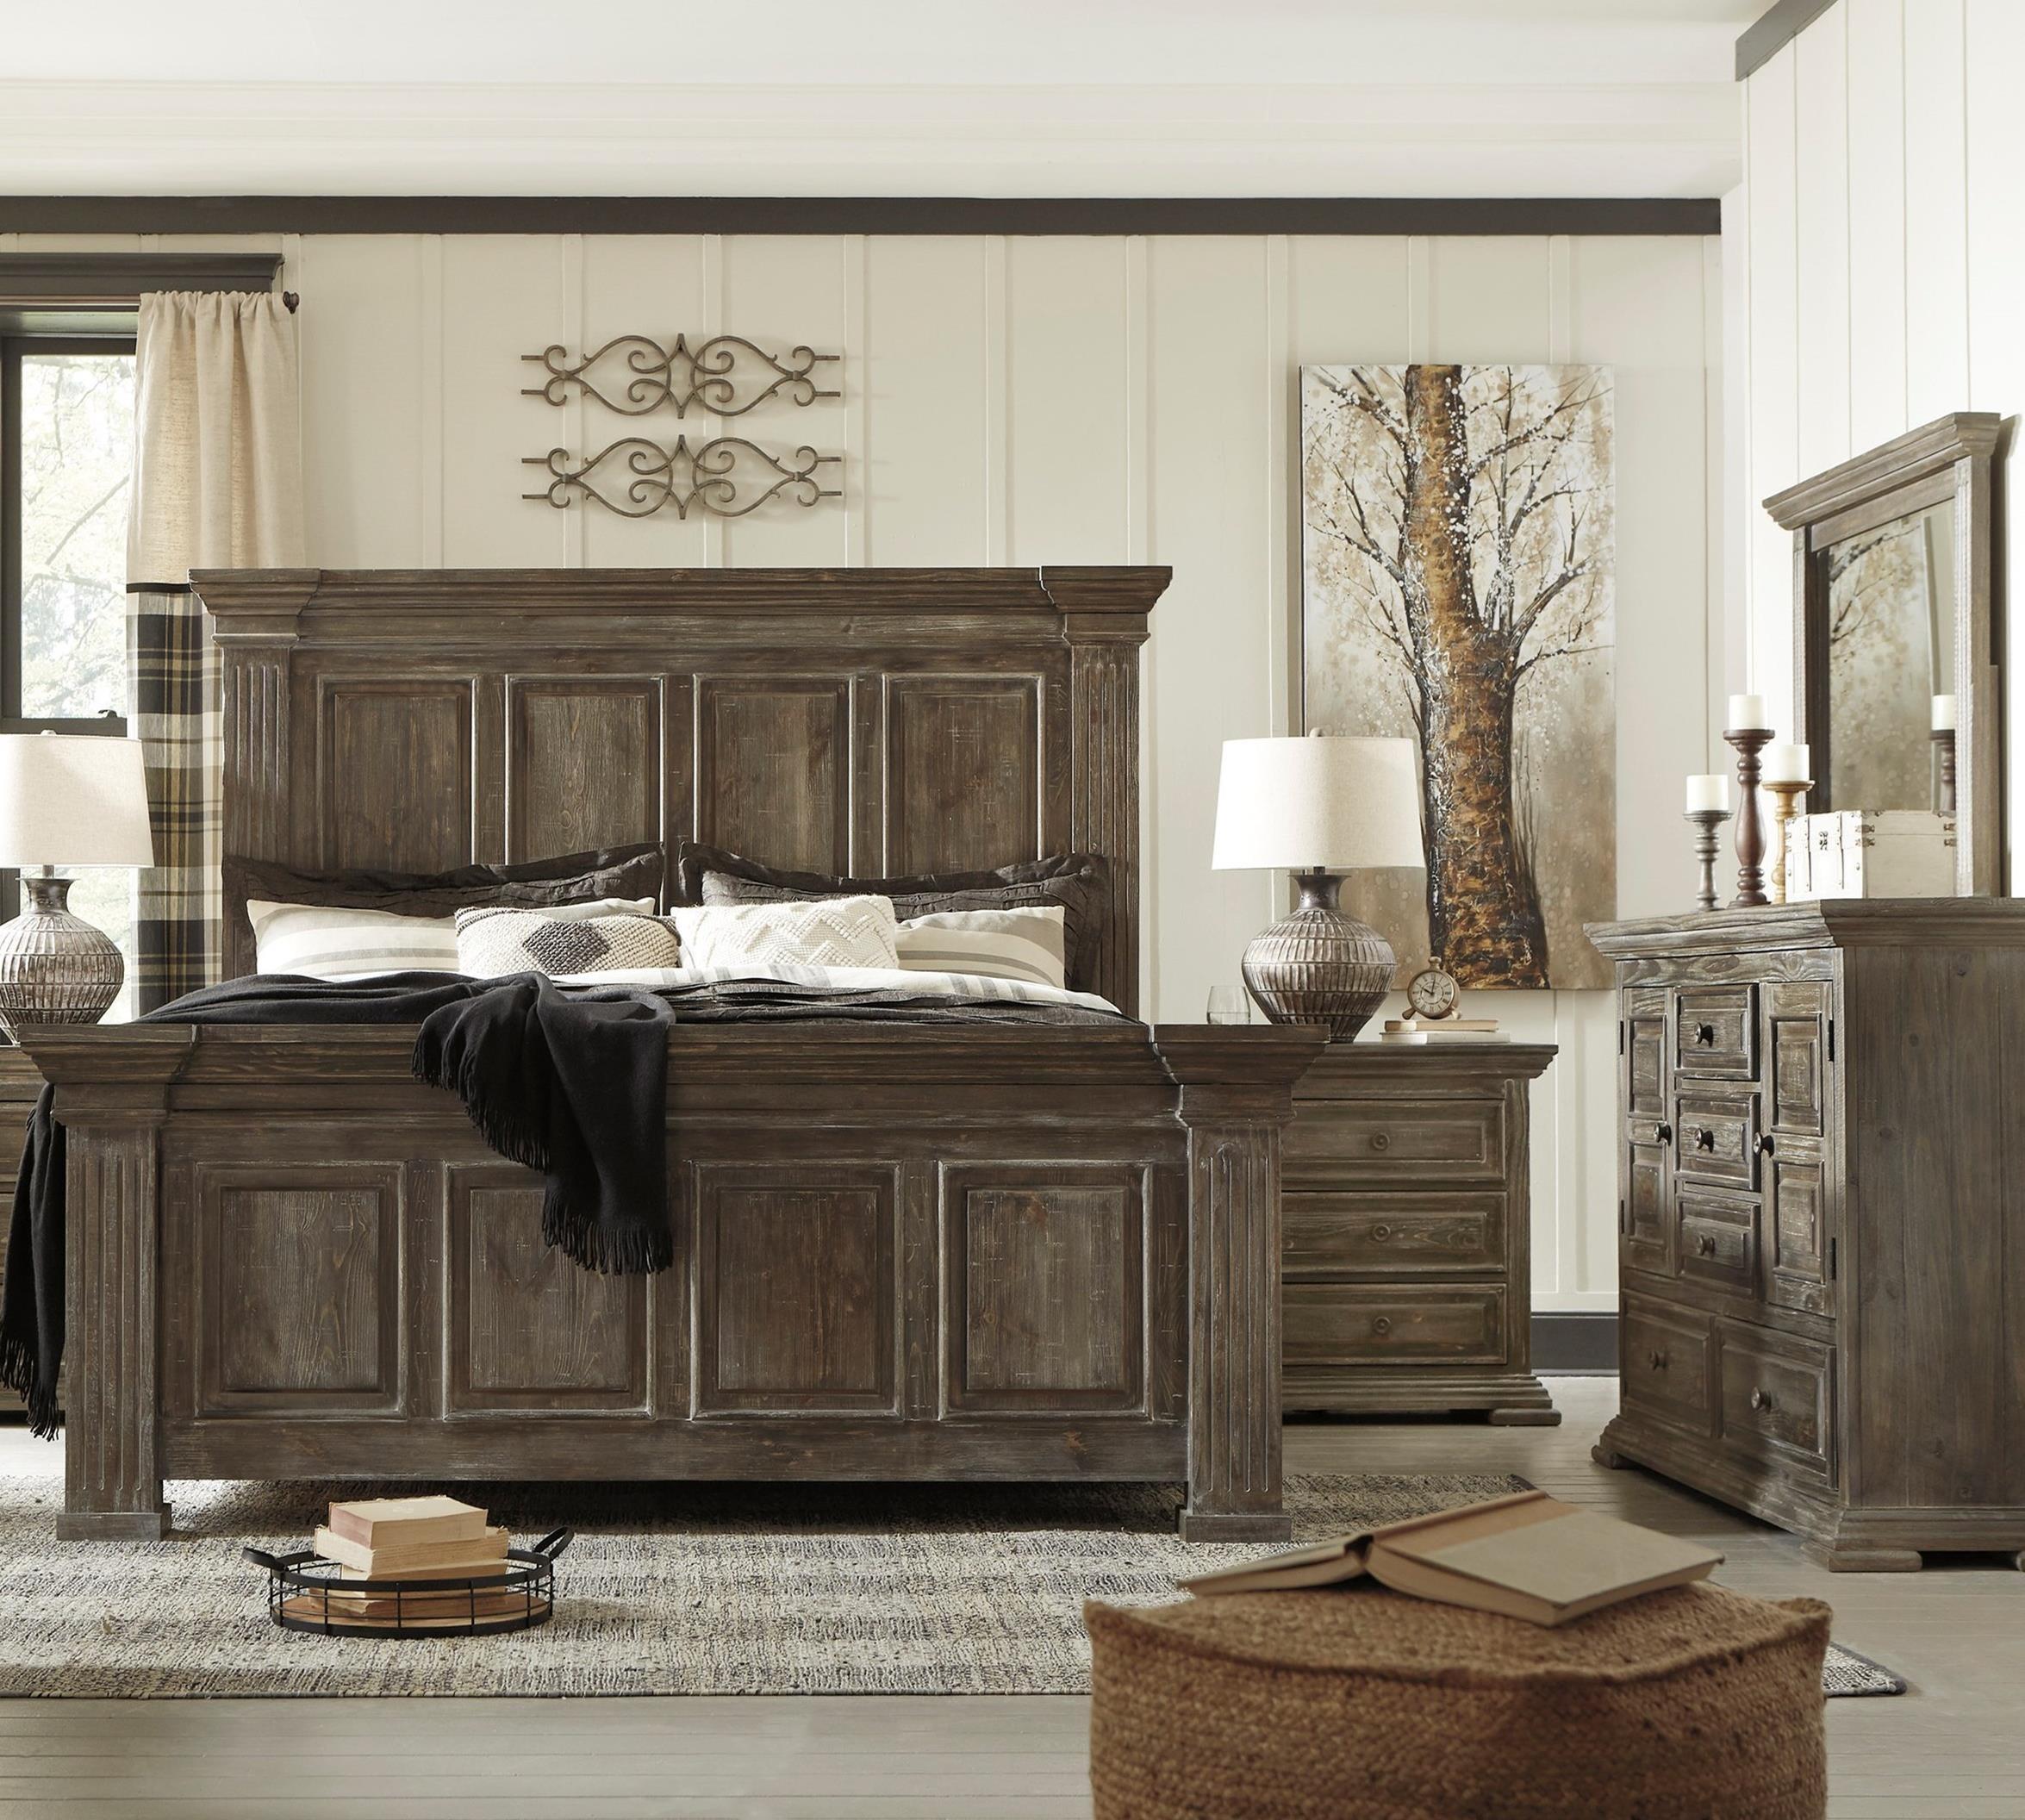 Signature Design By Ashley Wyndahl B813 Ck Bedroom Group 2 California King Bedroom Group Pilgrim Furniture City Bedroom Groups